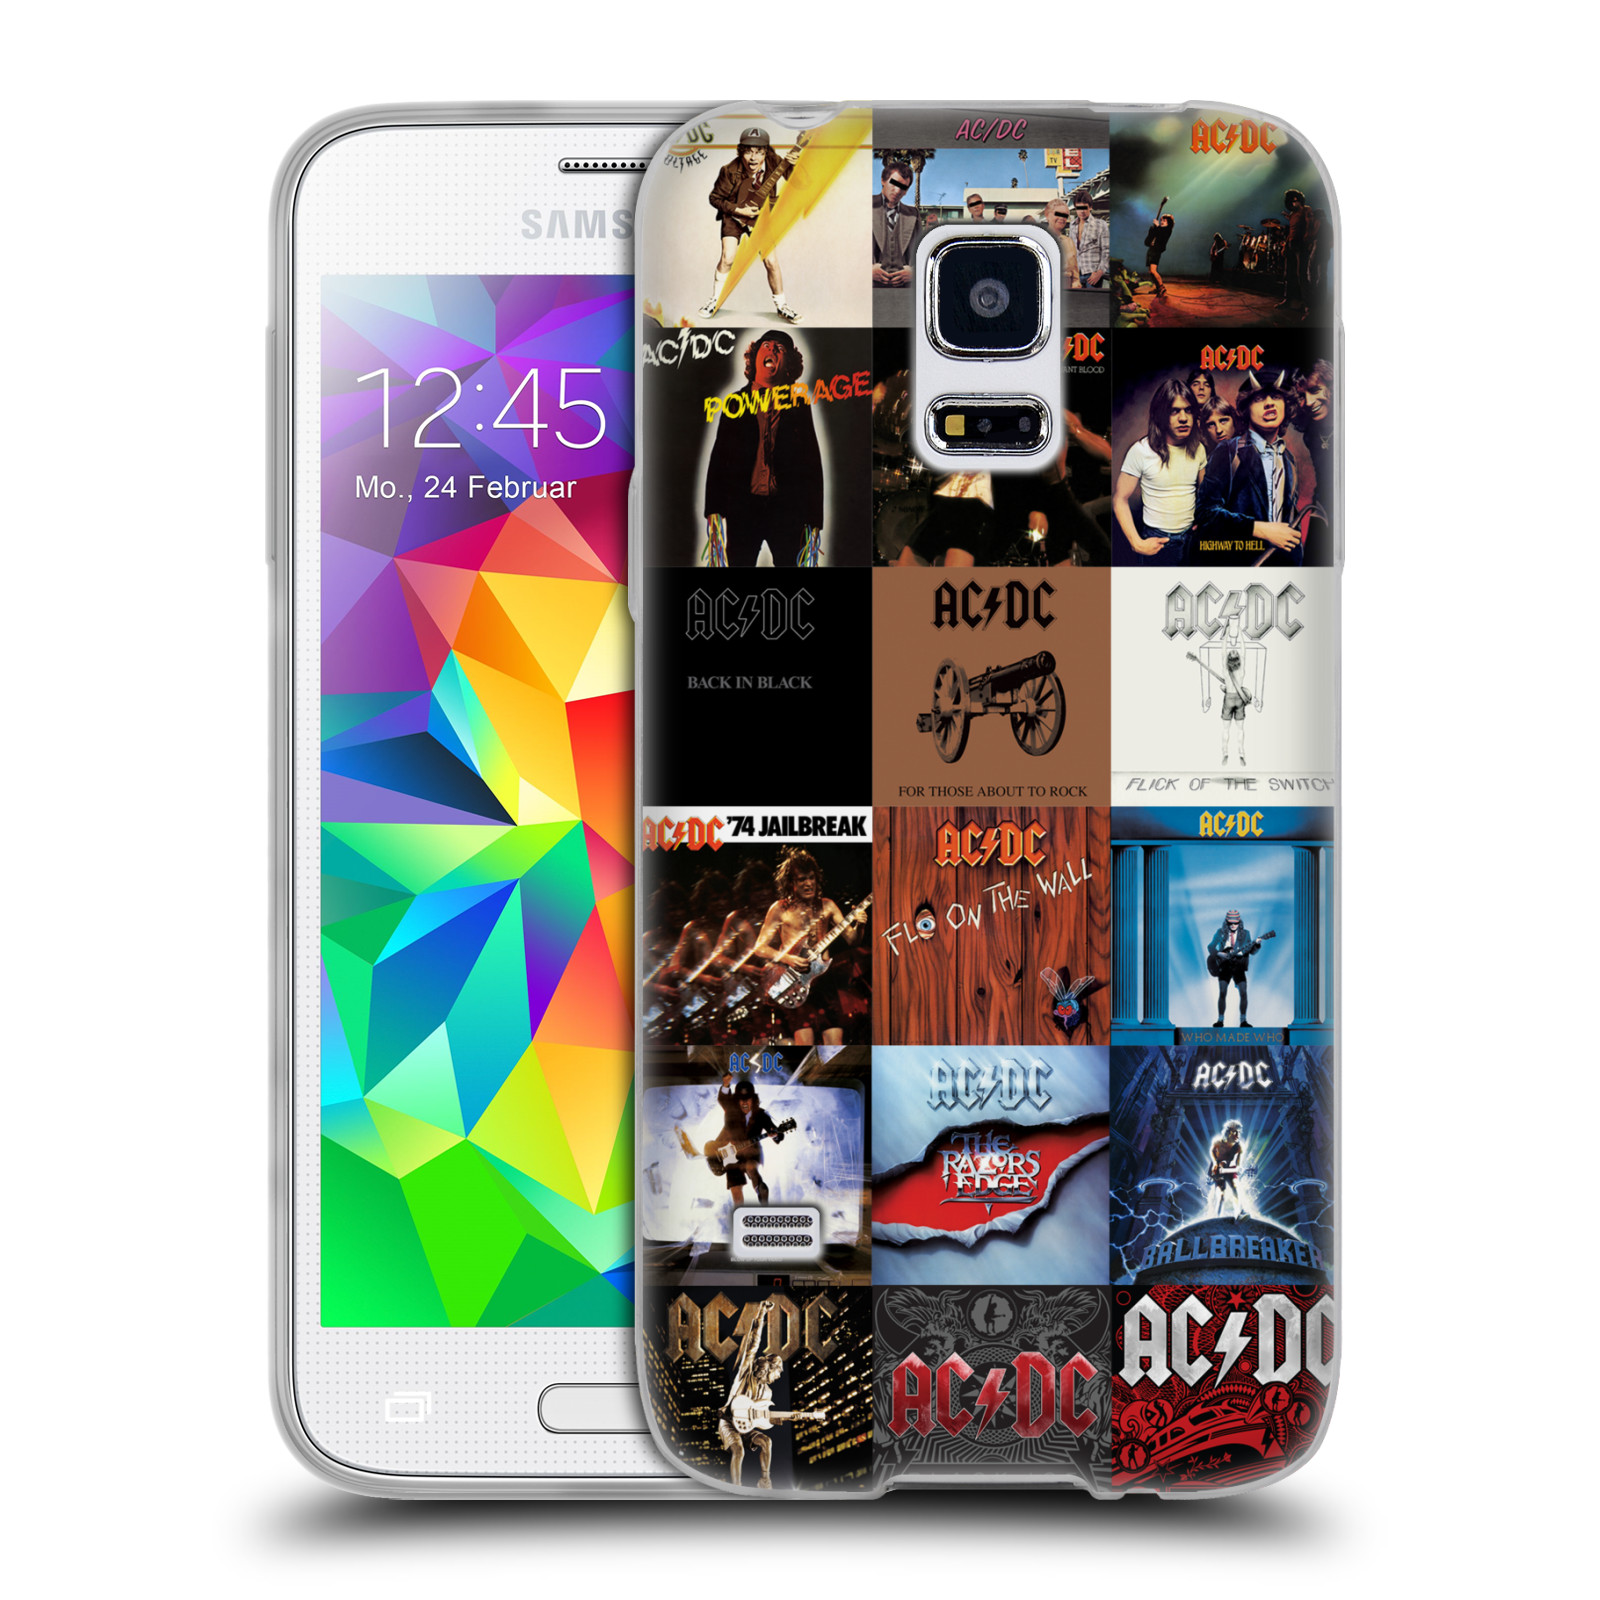 HEAD CASE silikonový obal na mobil Samsung Galaxy S5 MINI rocková skupina ACDC seznam alba